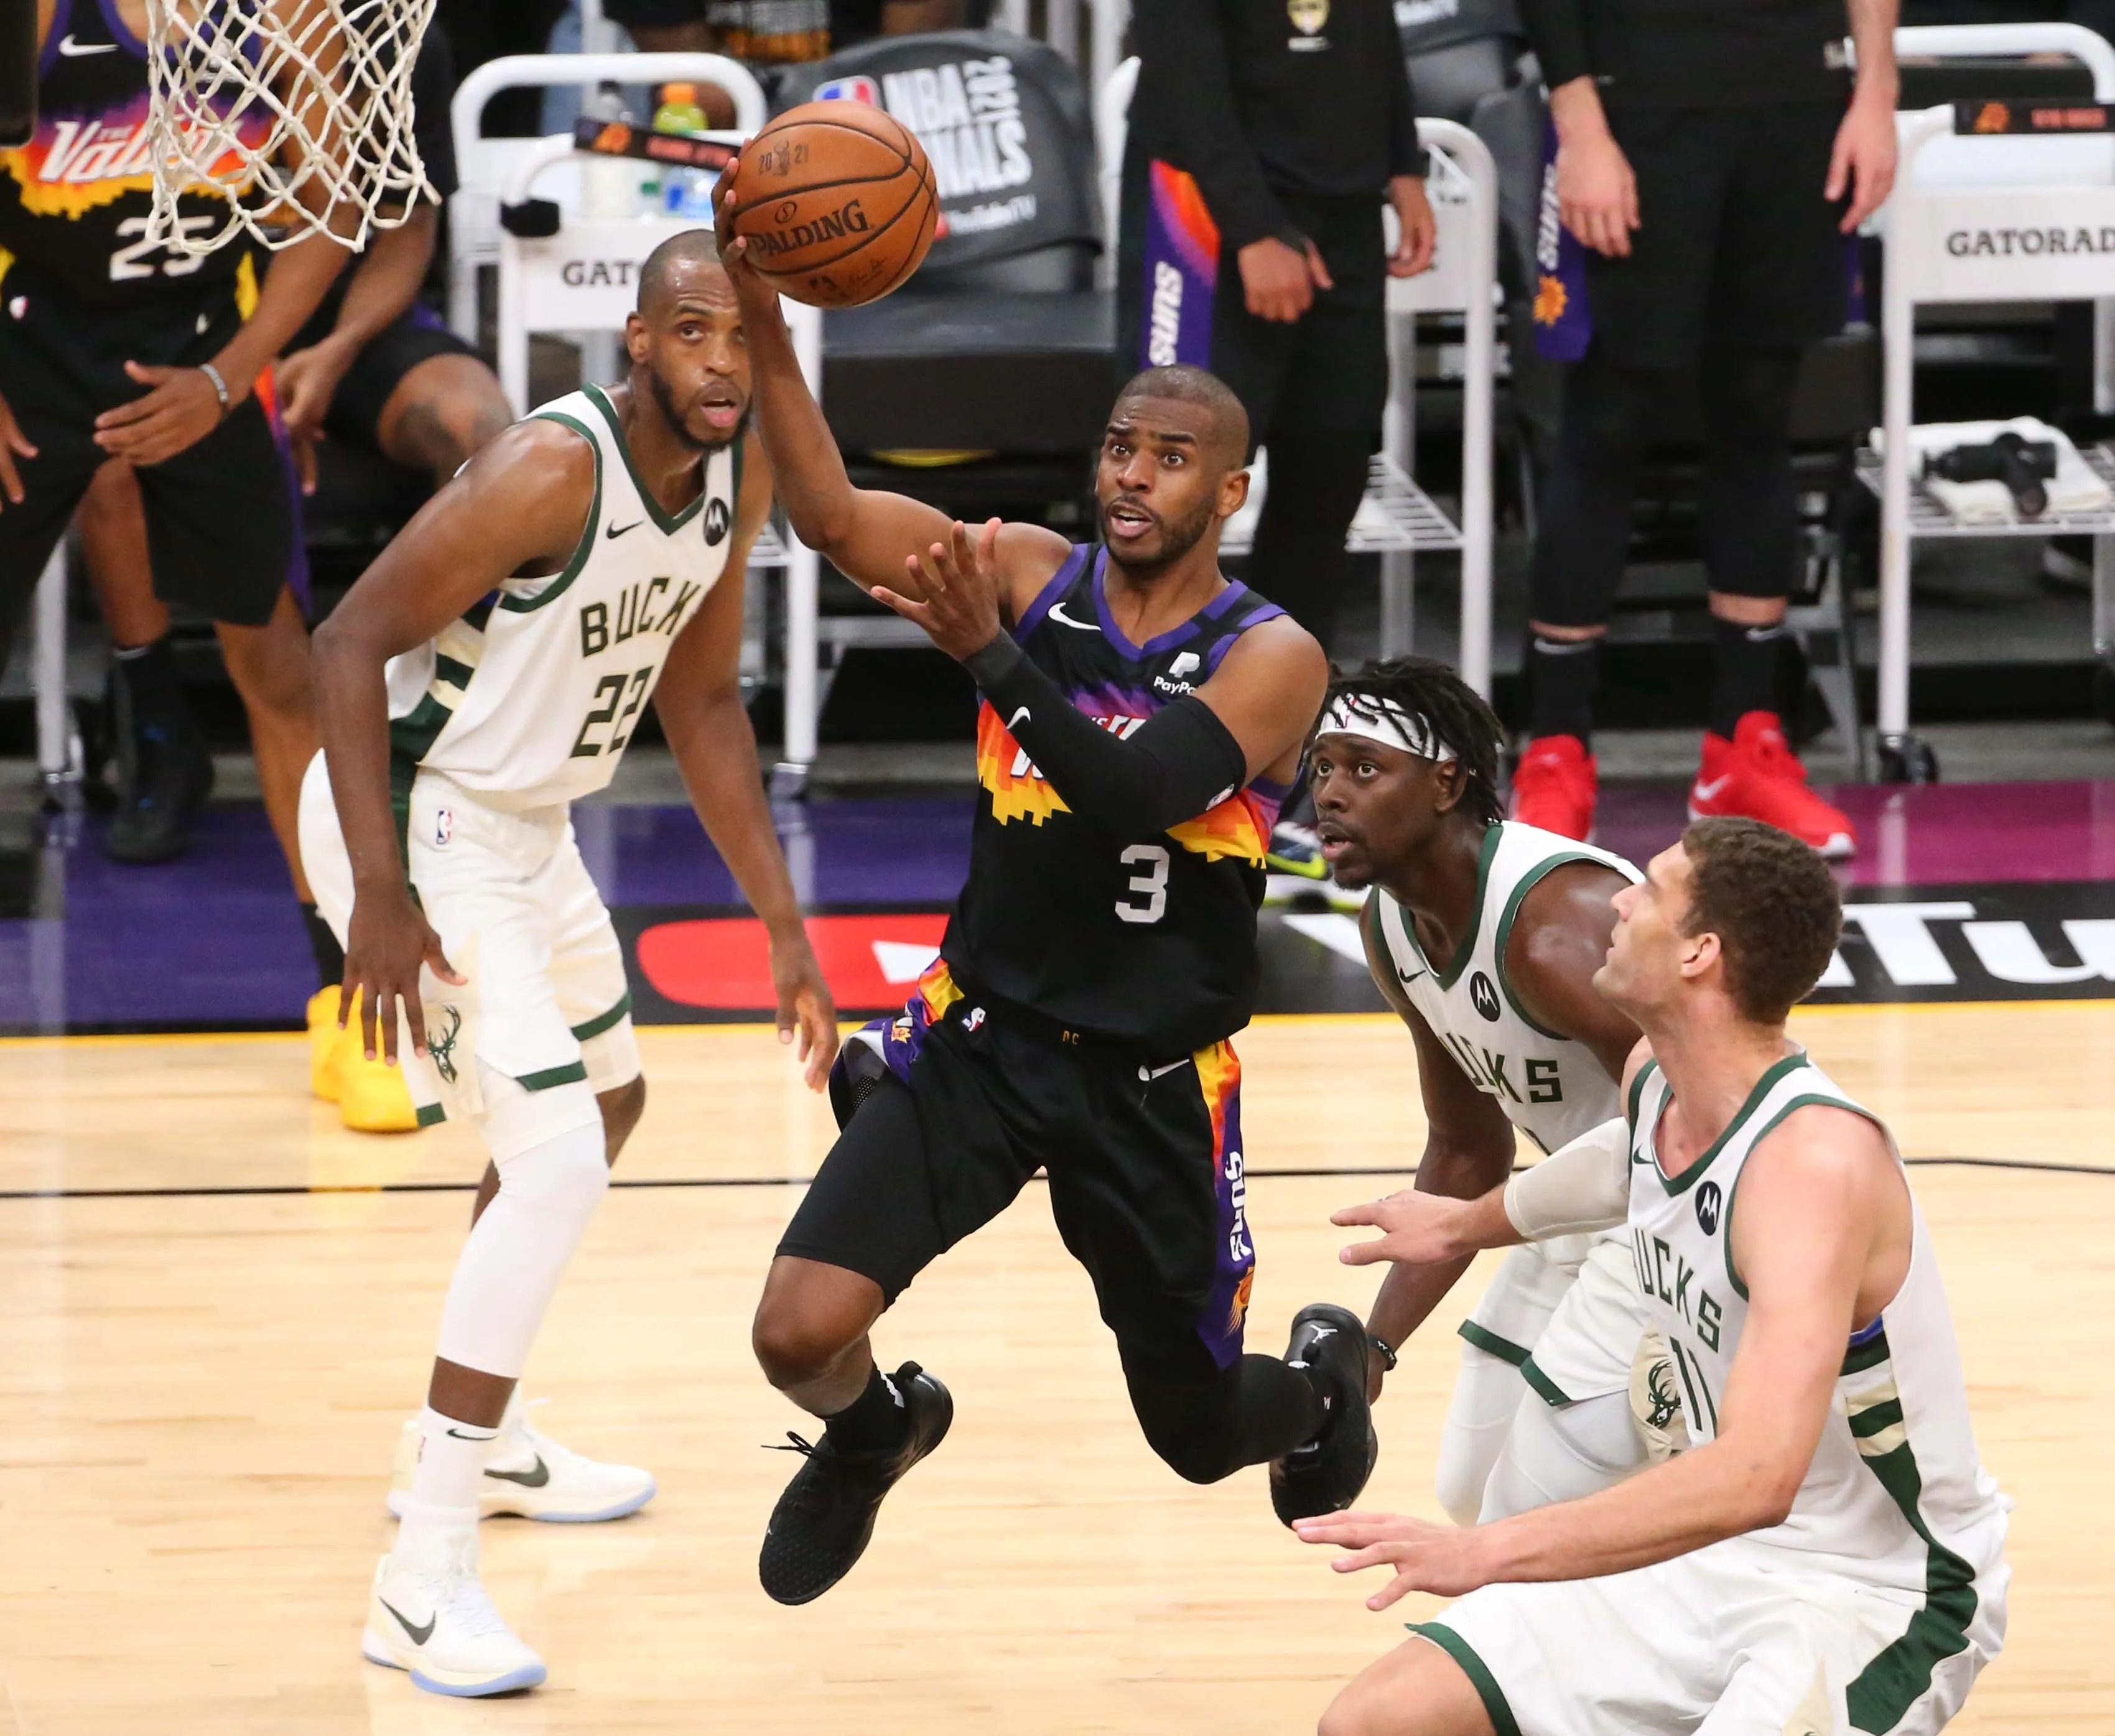 2021 NBA Finals: Suns vs Bucks Game 4 Predictions Against the Spread